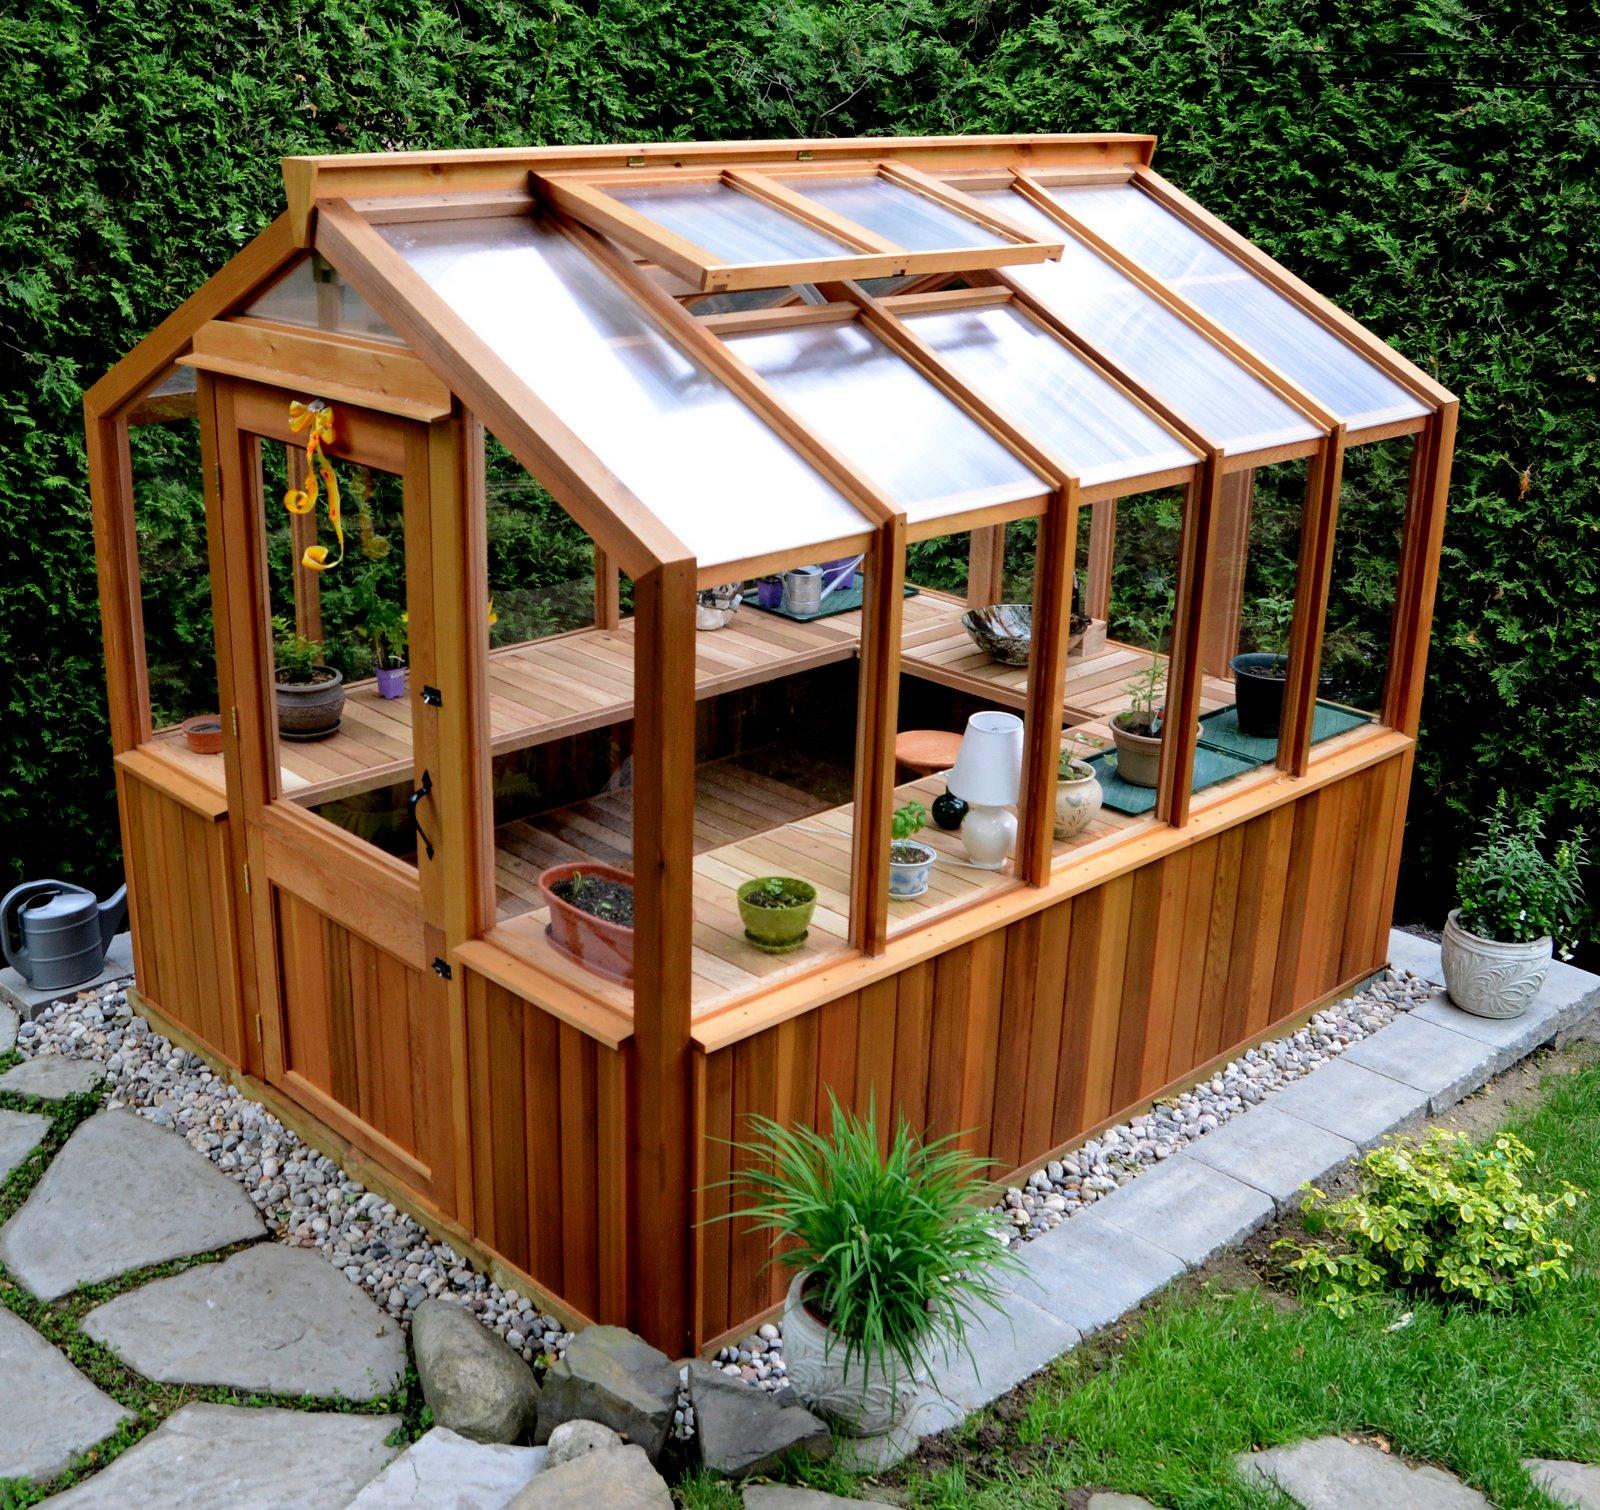 DELUXE FREESTANDING - Freestanding greenhouse with 30